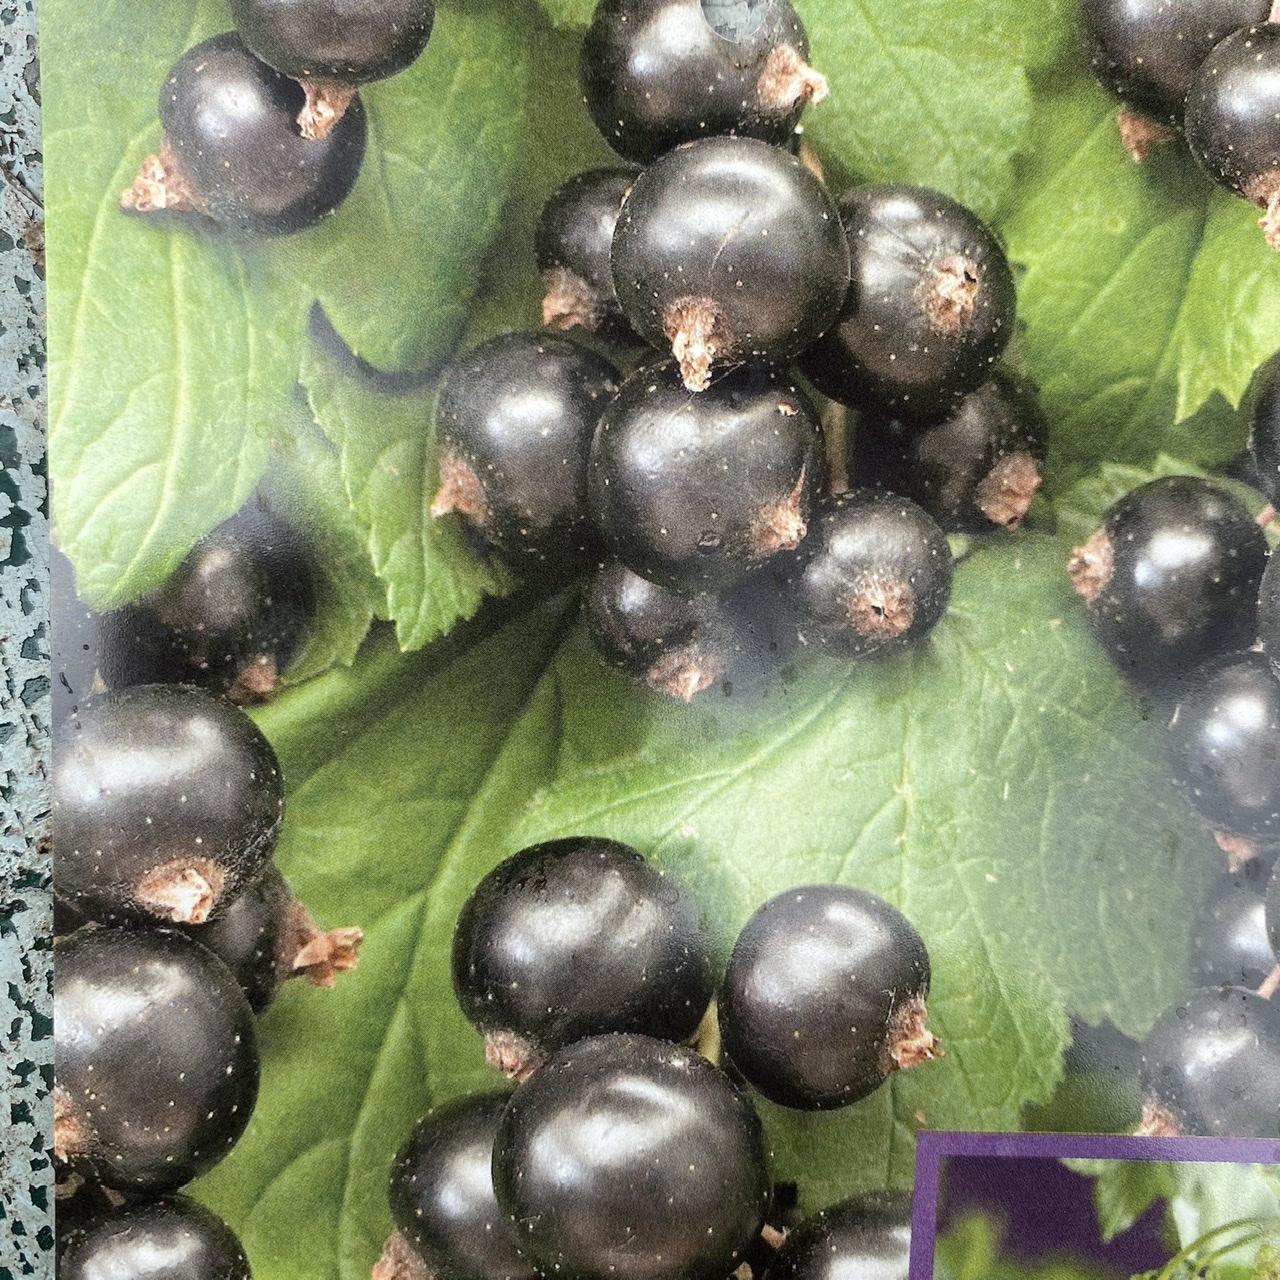 Ribes nigrum 'Ben Nevis' (Black Currant 'Ben Nevis')